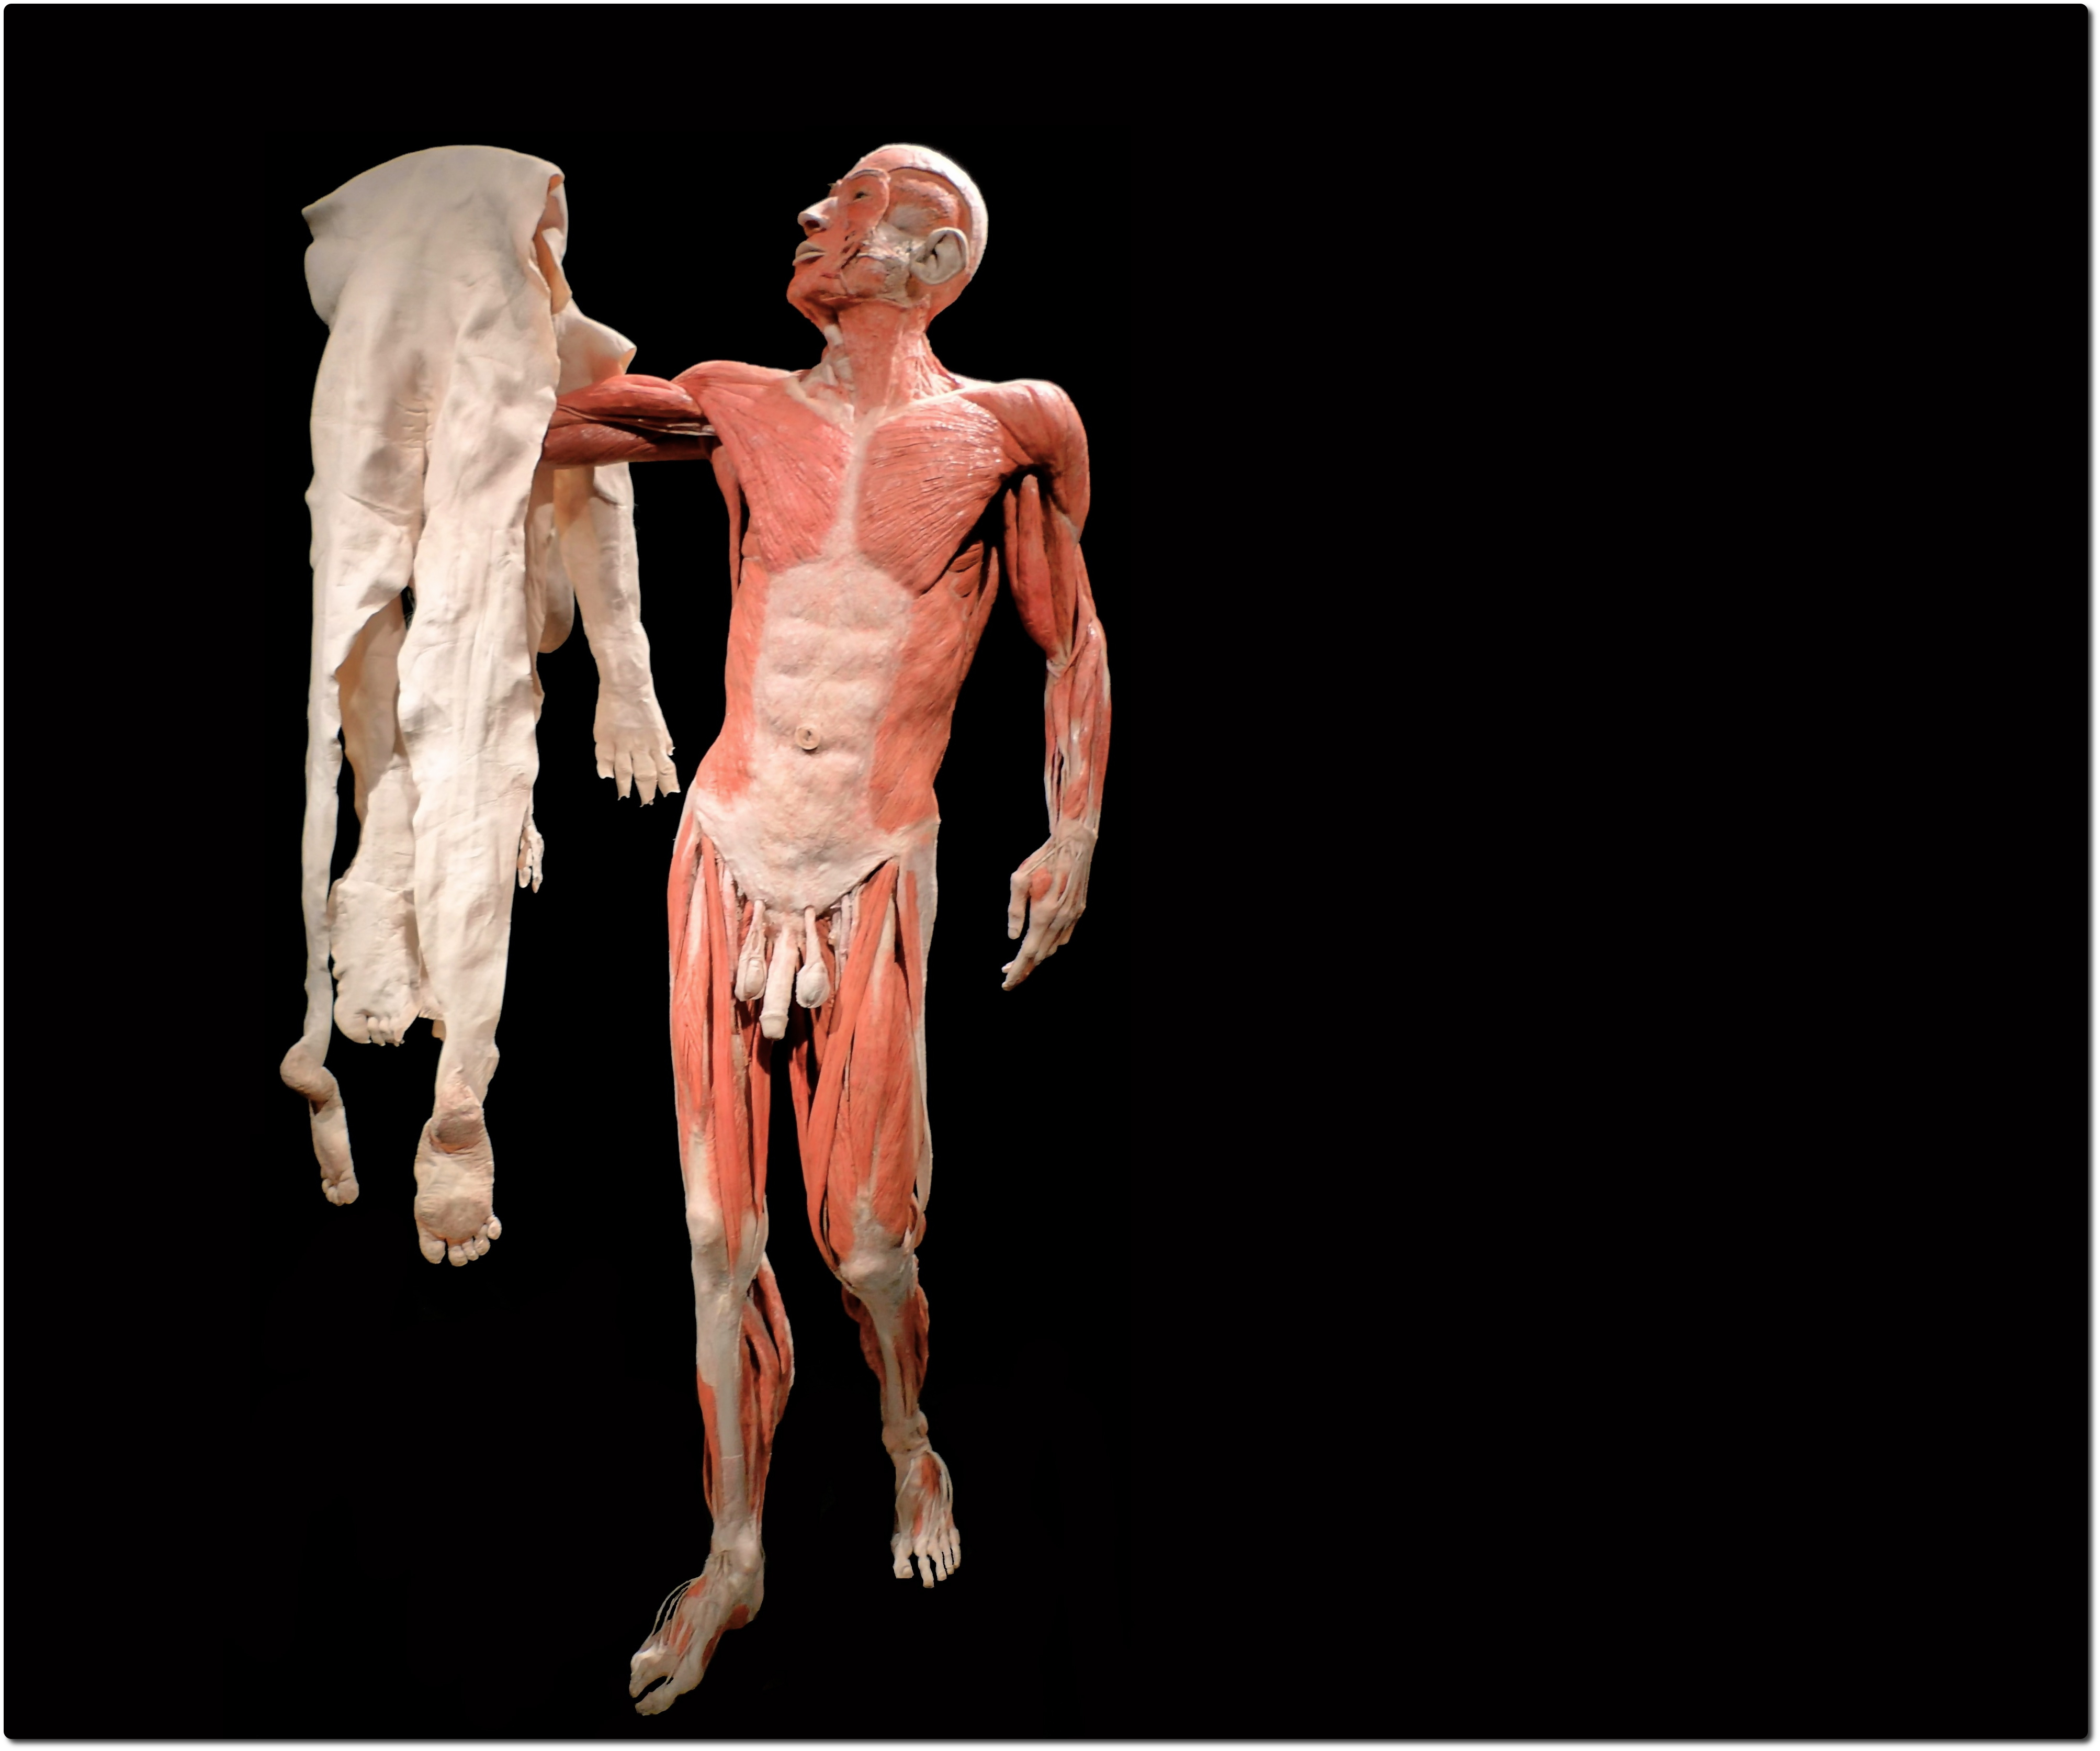 Cadaver human anatomy